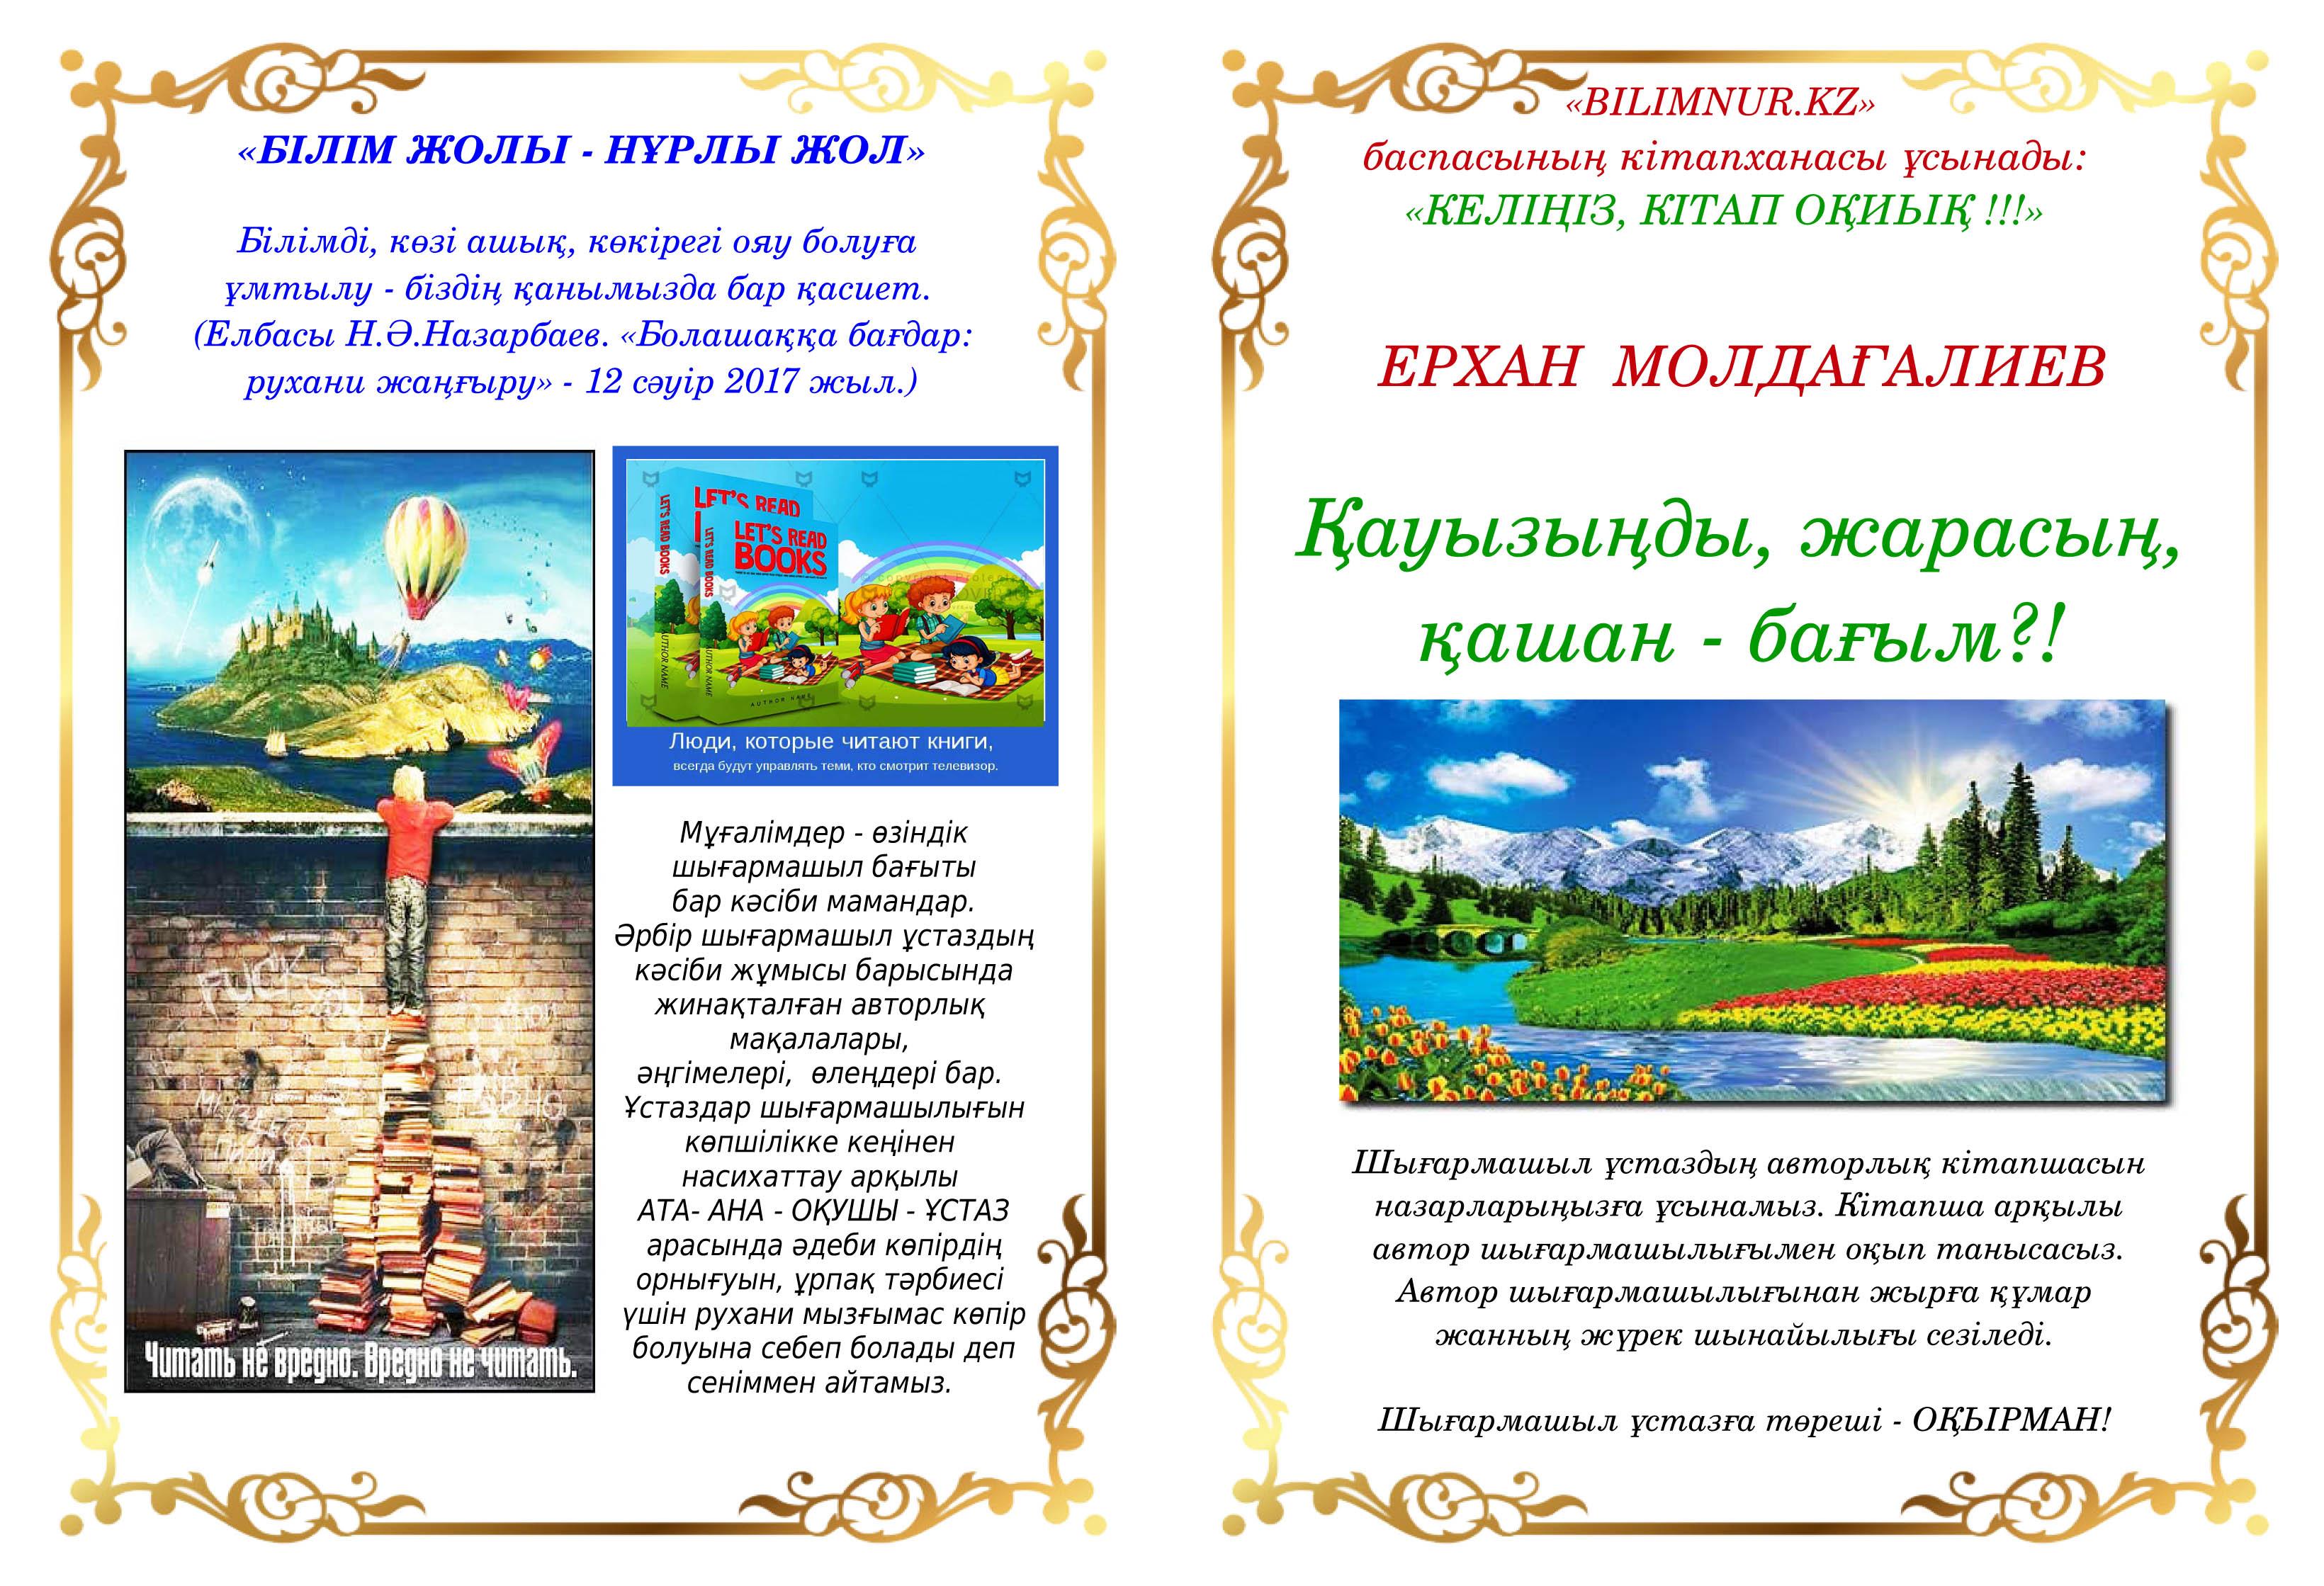 Неміс картасы ойыны